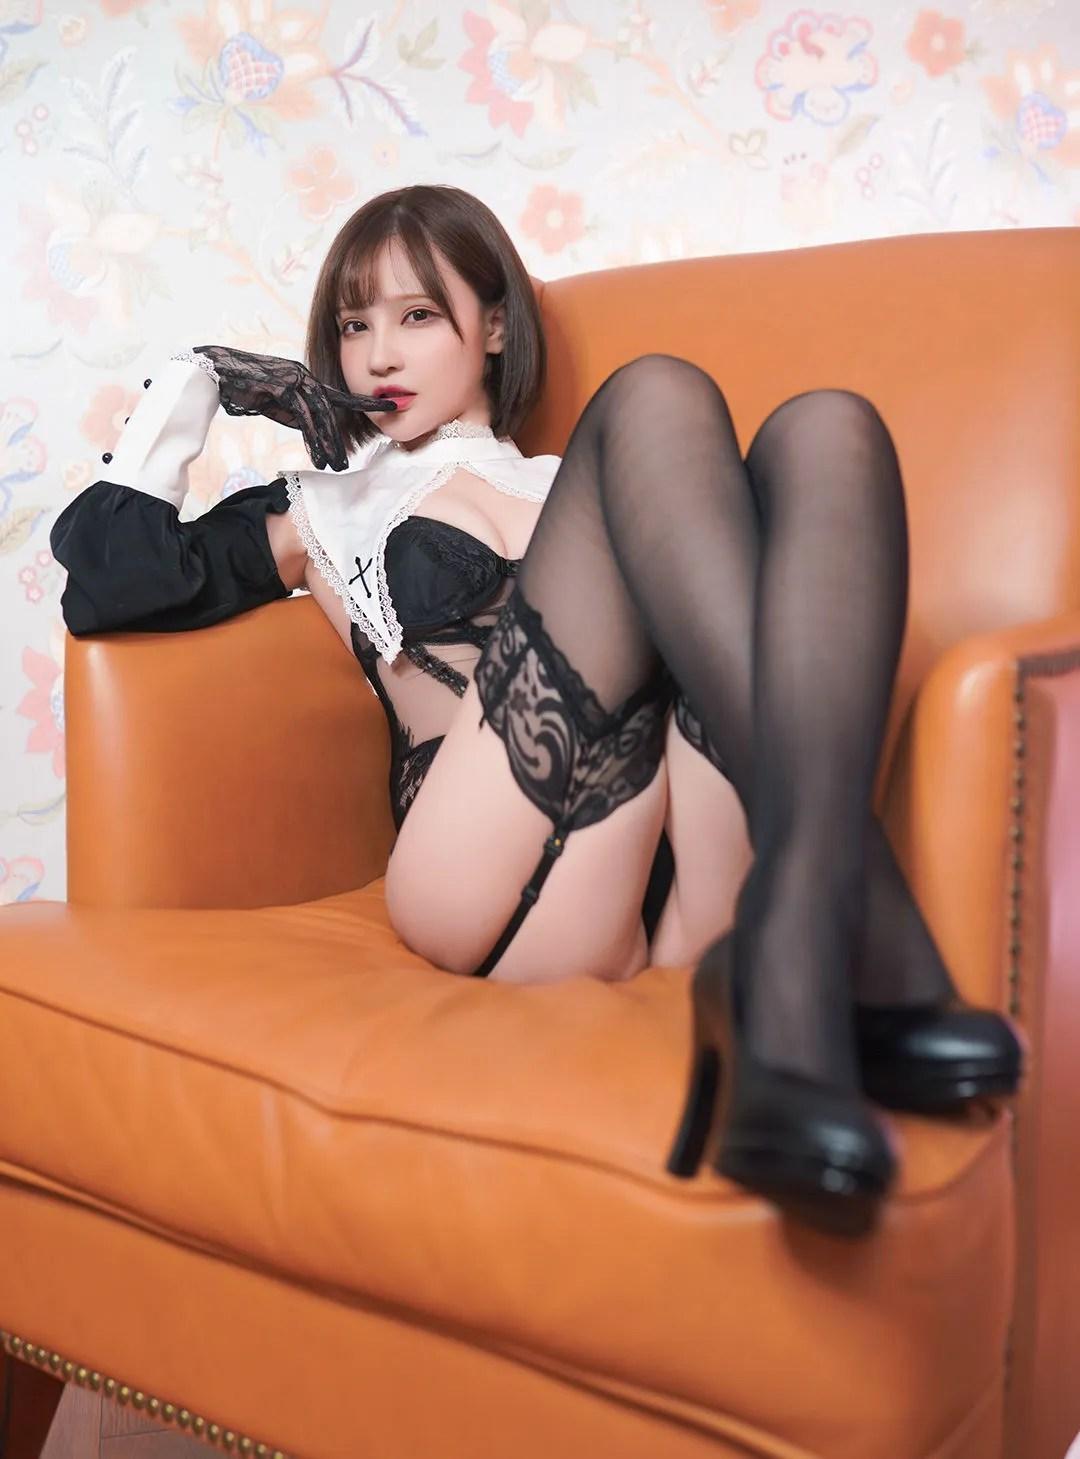 [COS福利] 千夜未来(Senya Miku)- 修道女 写真套图[30P]插图(4)